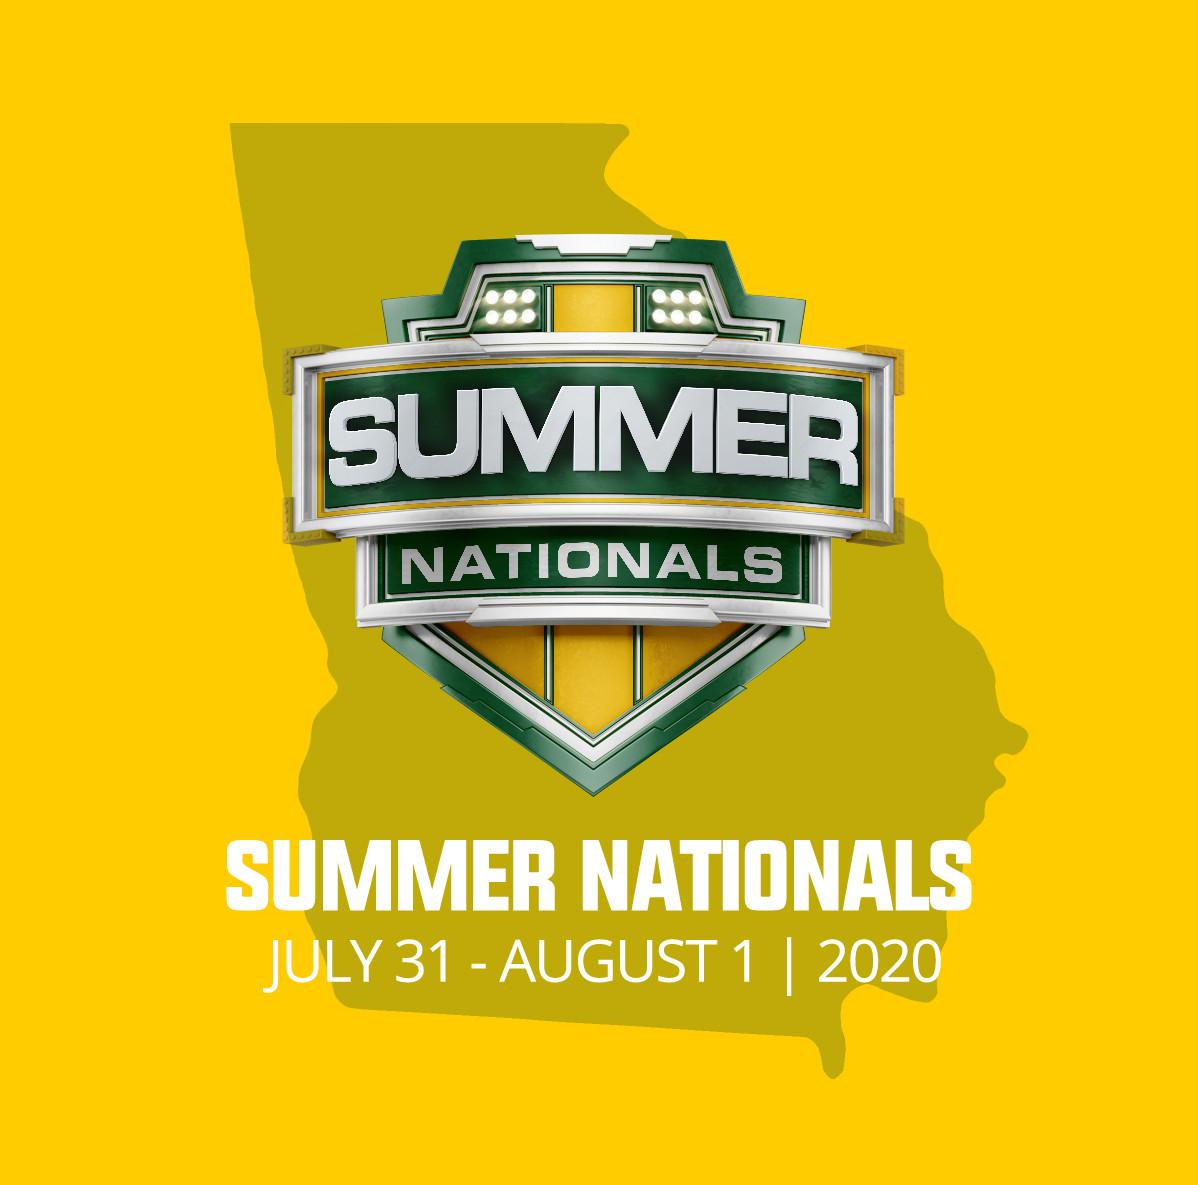 Upstate - SUMMER NATIONALS